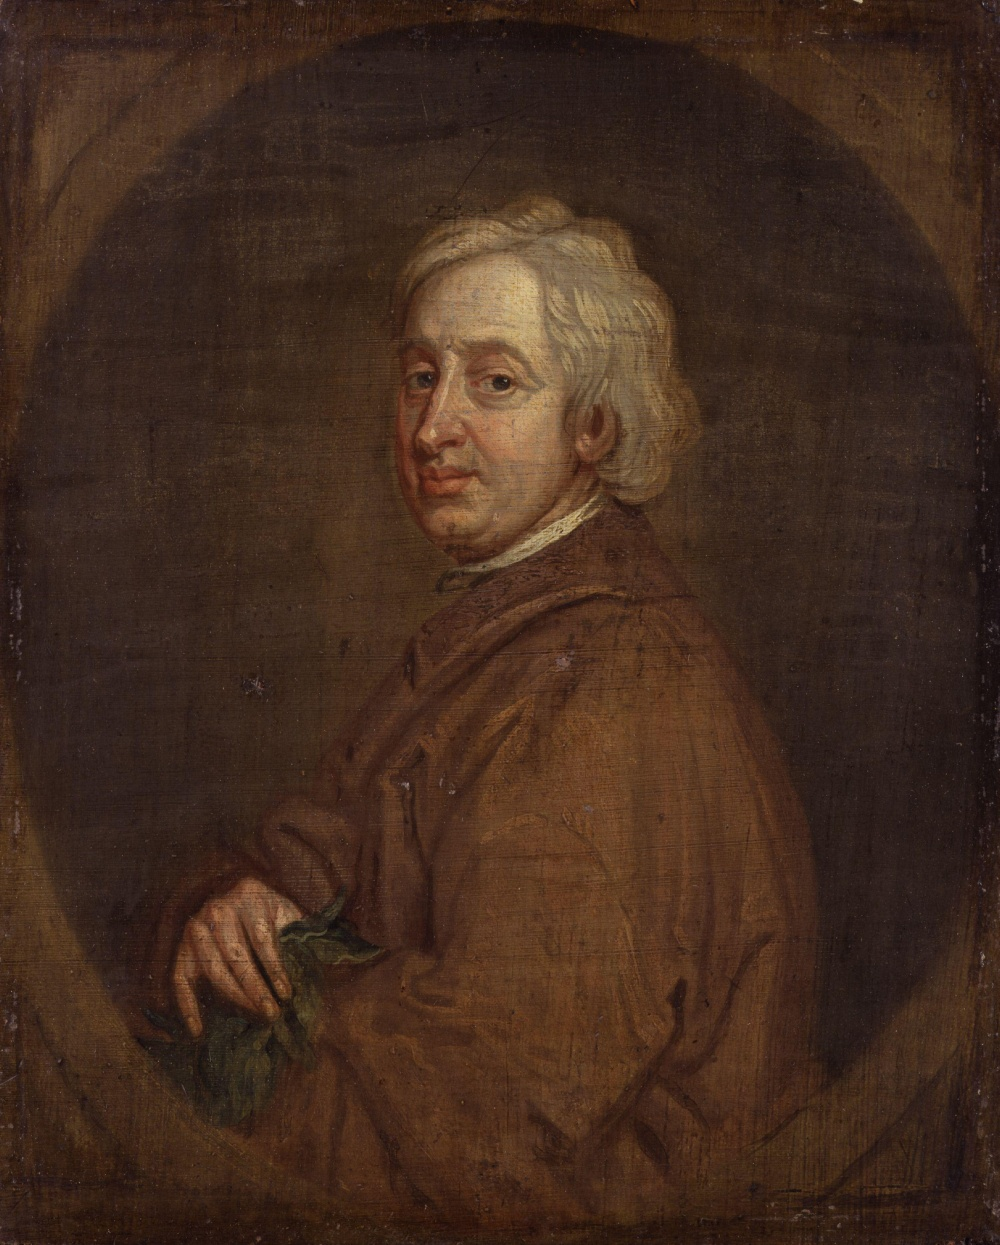 John Dryden (Sir Godfrey Kneller)